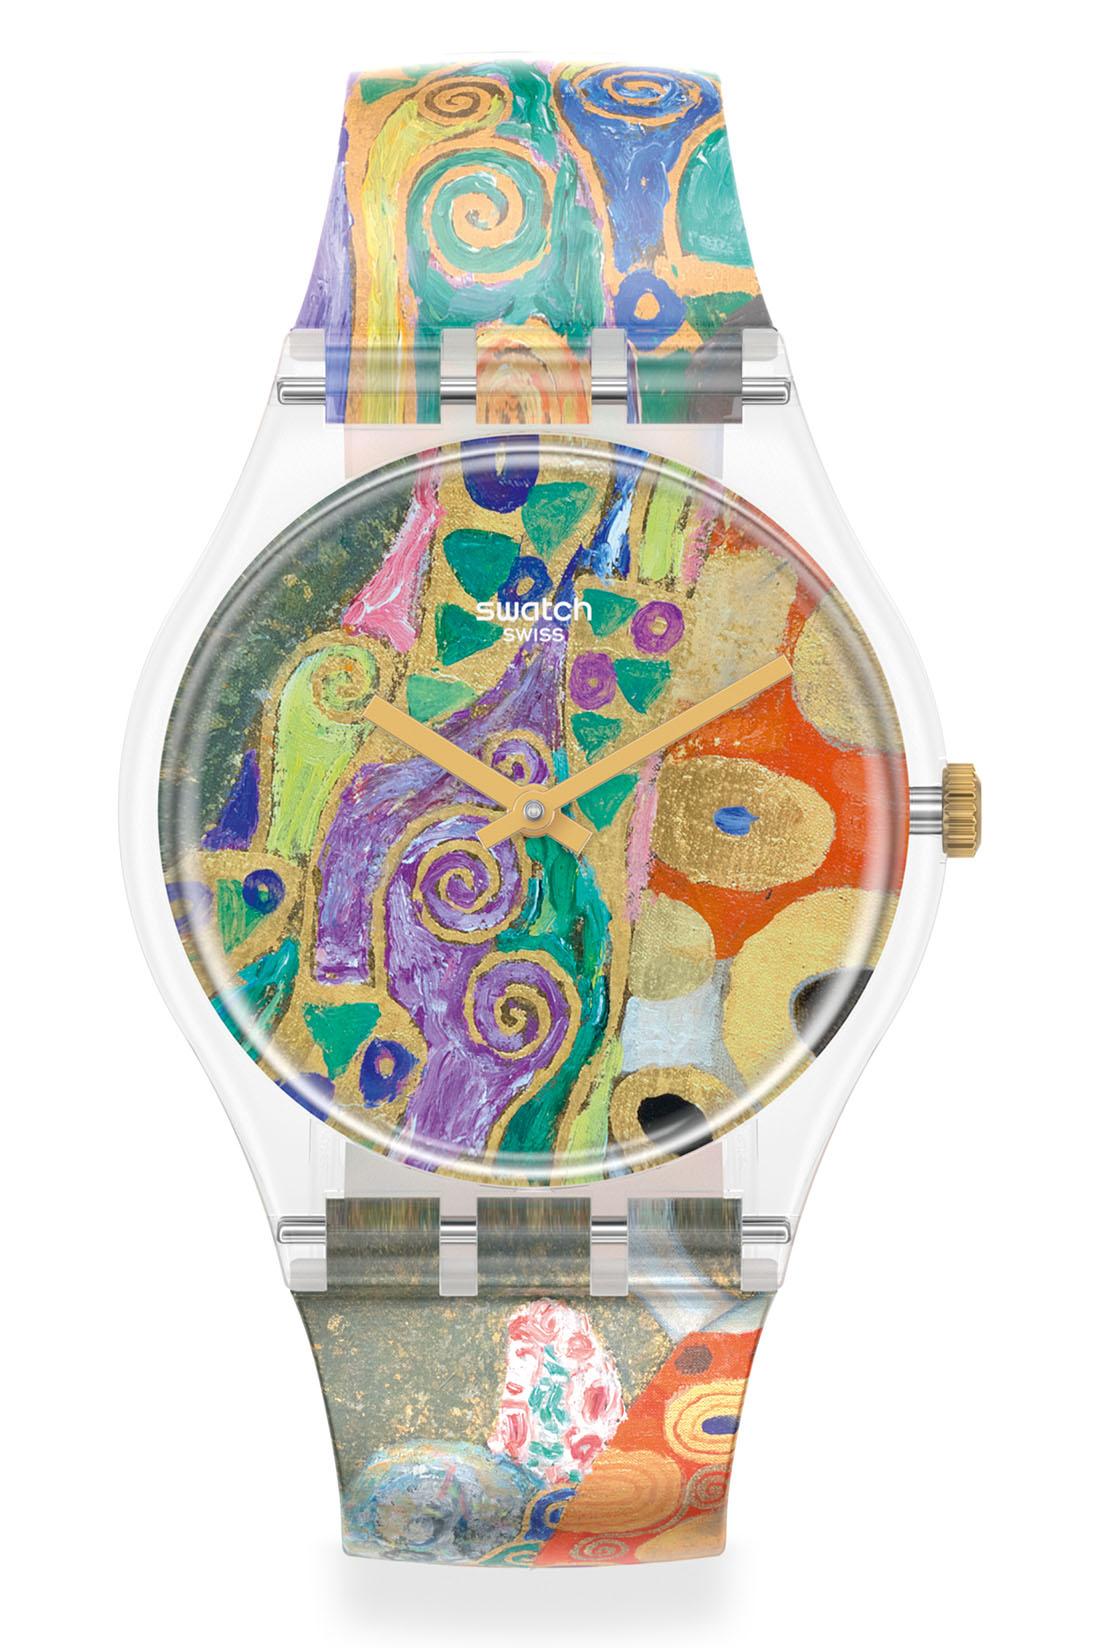 Swatch x MoMA New York - Hope II